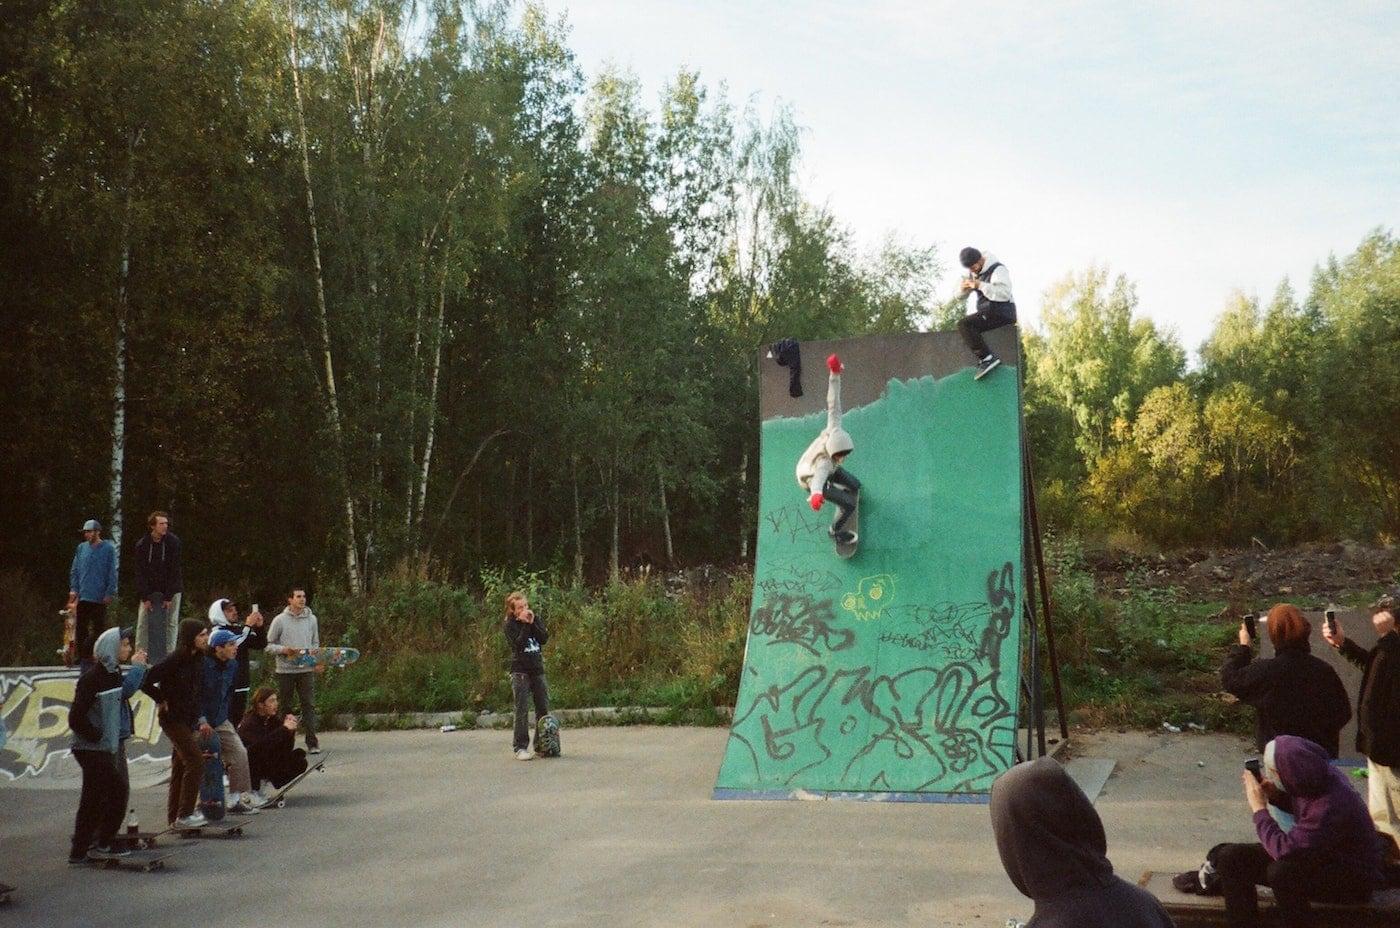 Skatboardkurs für Kinder in der Skatehalle Berlin in den Herbstferien Ferienkurse Sport c Aleksandr Neplokhov // HIMBEER